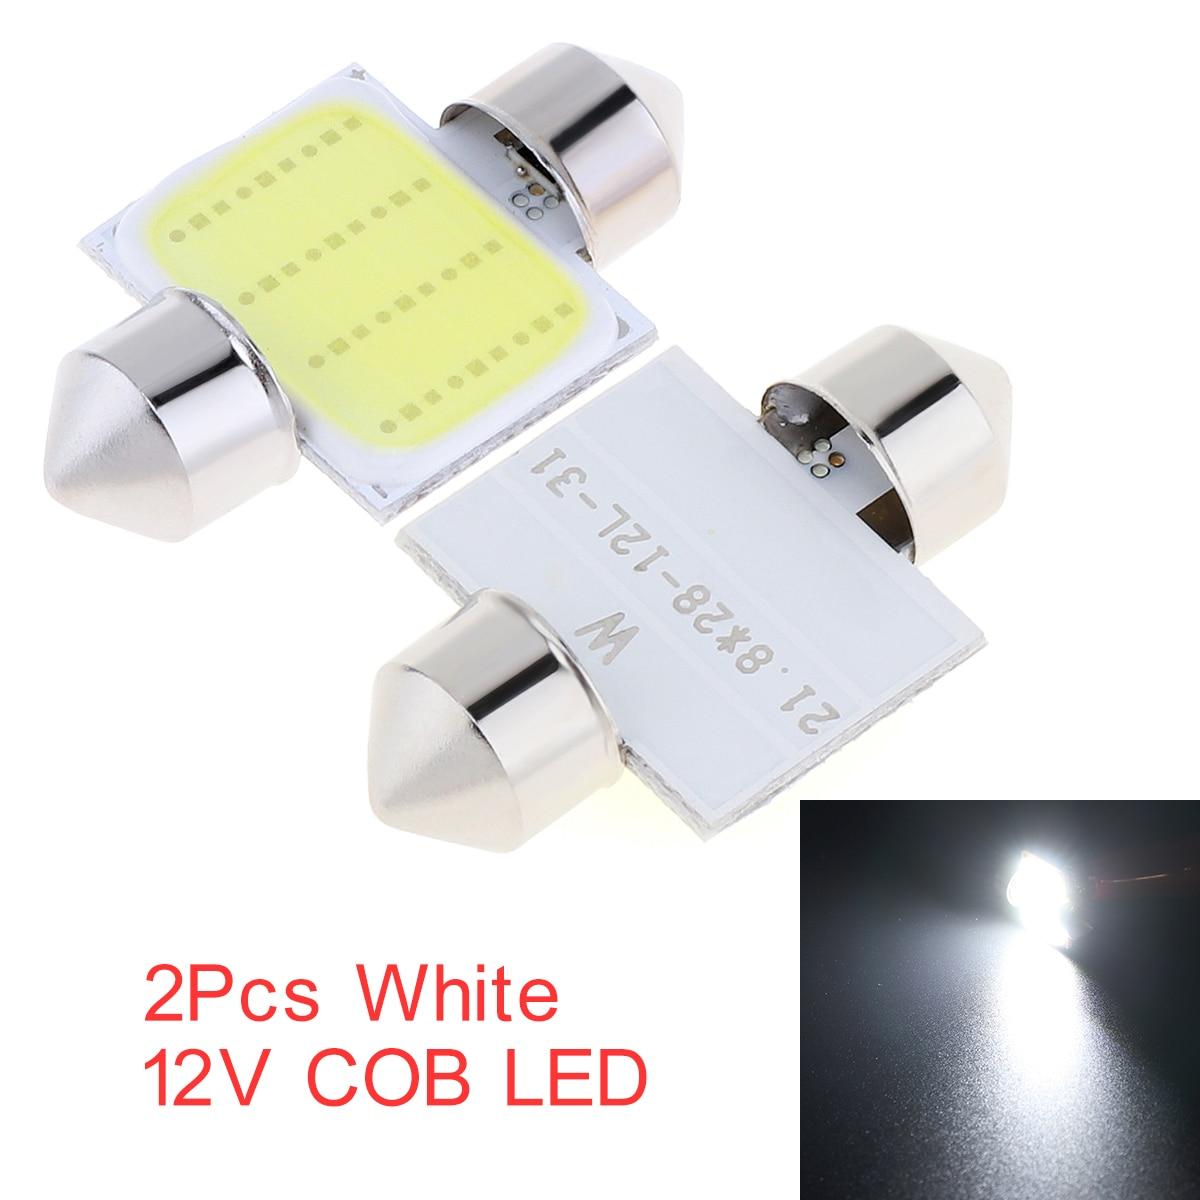 2PCS Auto Licht Weiß 31mm 12-SMD 12V COB LED Auto Innen Dome Karte Licht Lampen DE3175 Für auto Fahrzeug Auto